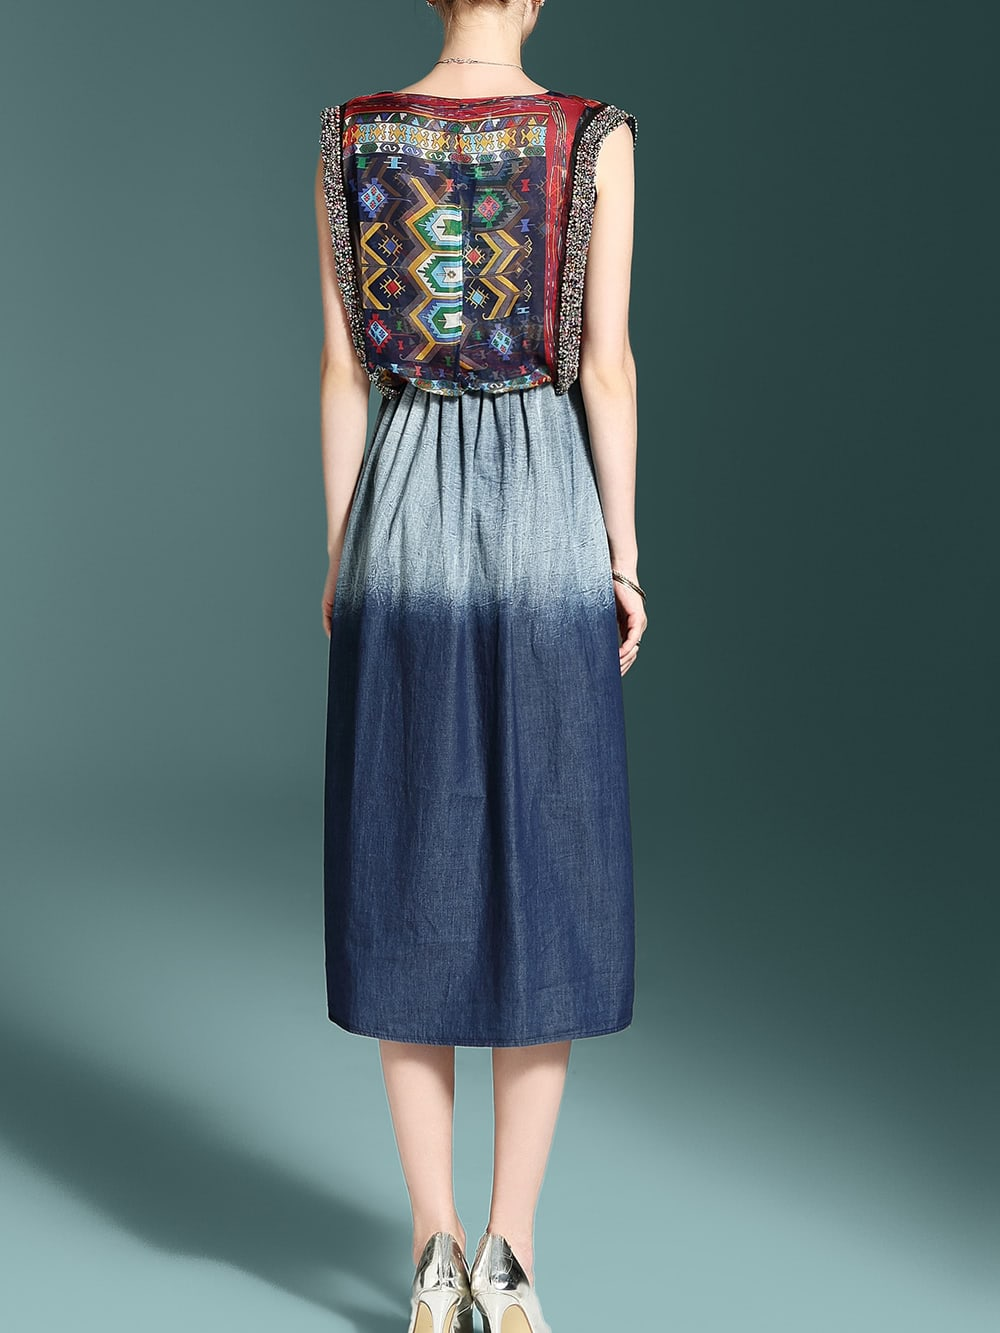 Tribal Print Gradient Dress Shein Sheinside